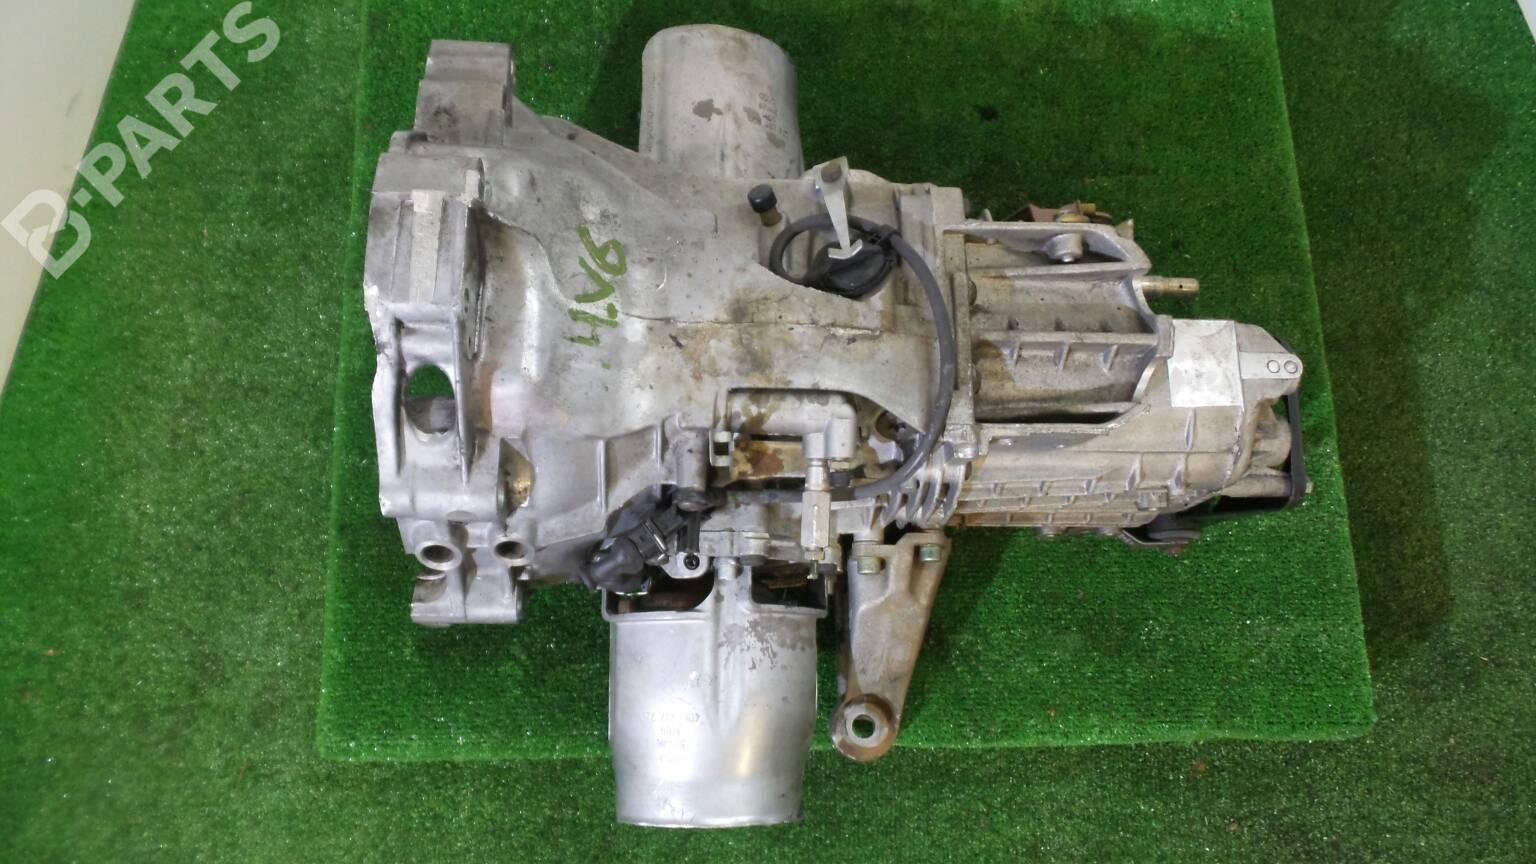 Manual Gearbox CXY AUDI, A4 (8D2, B5) 2.6(4 doors) ...